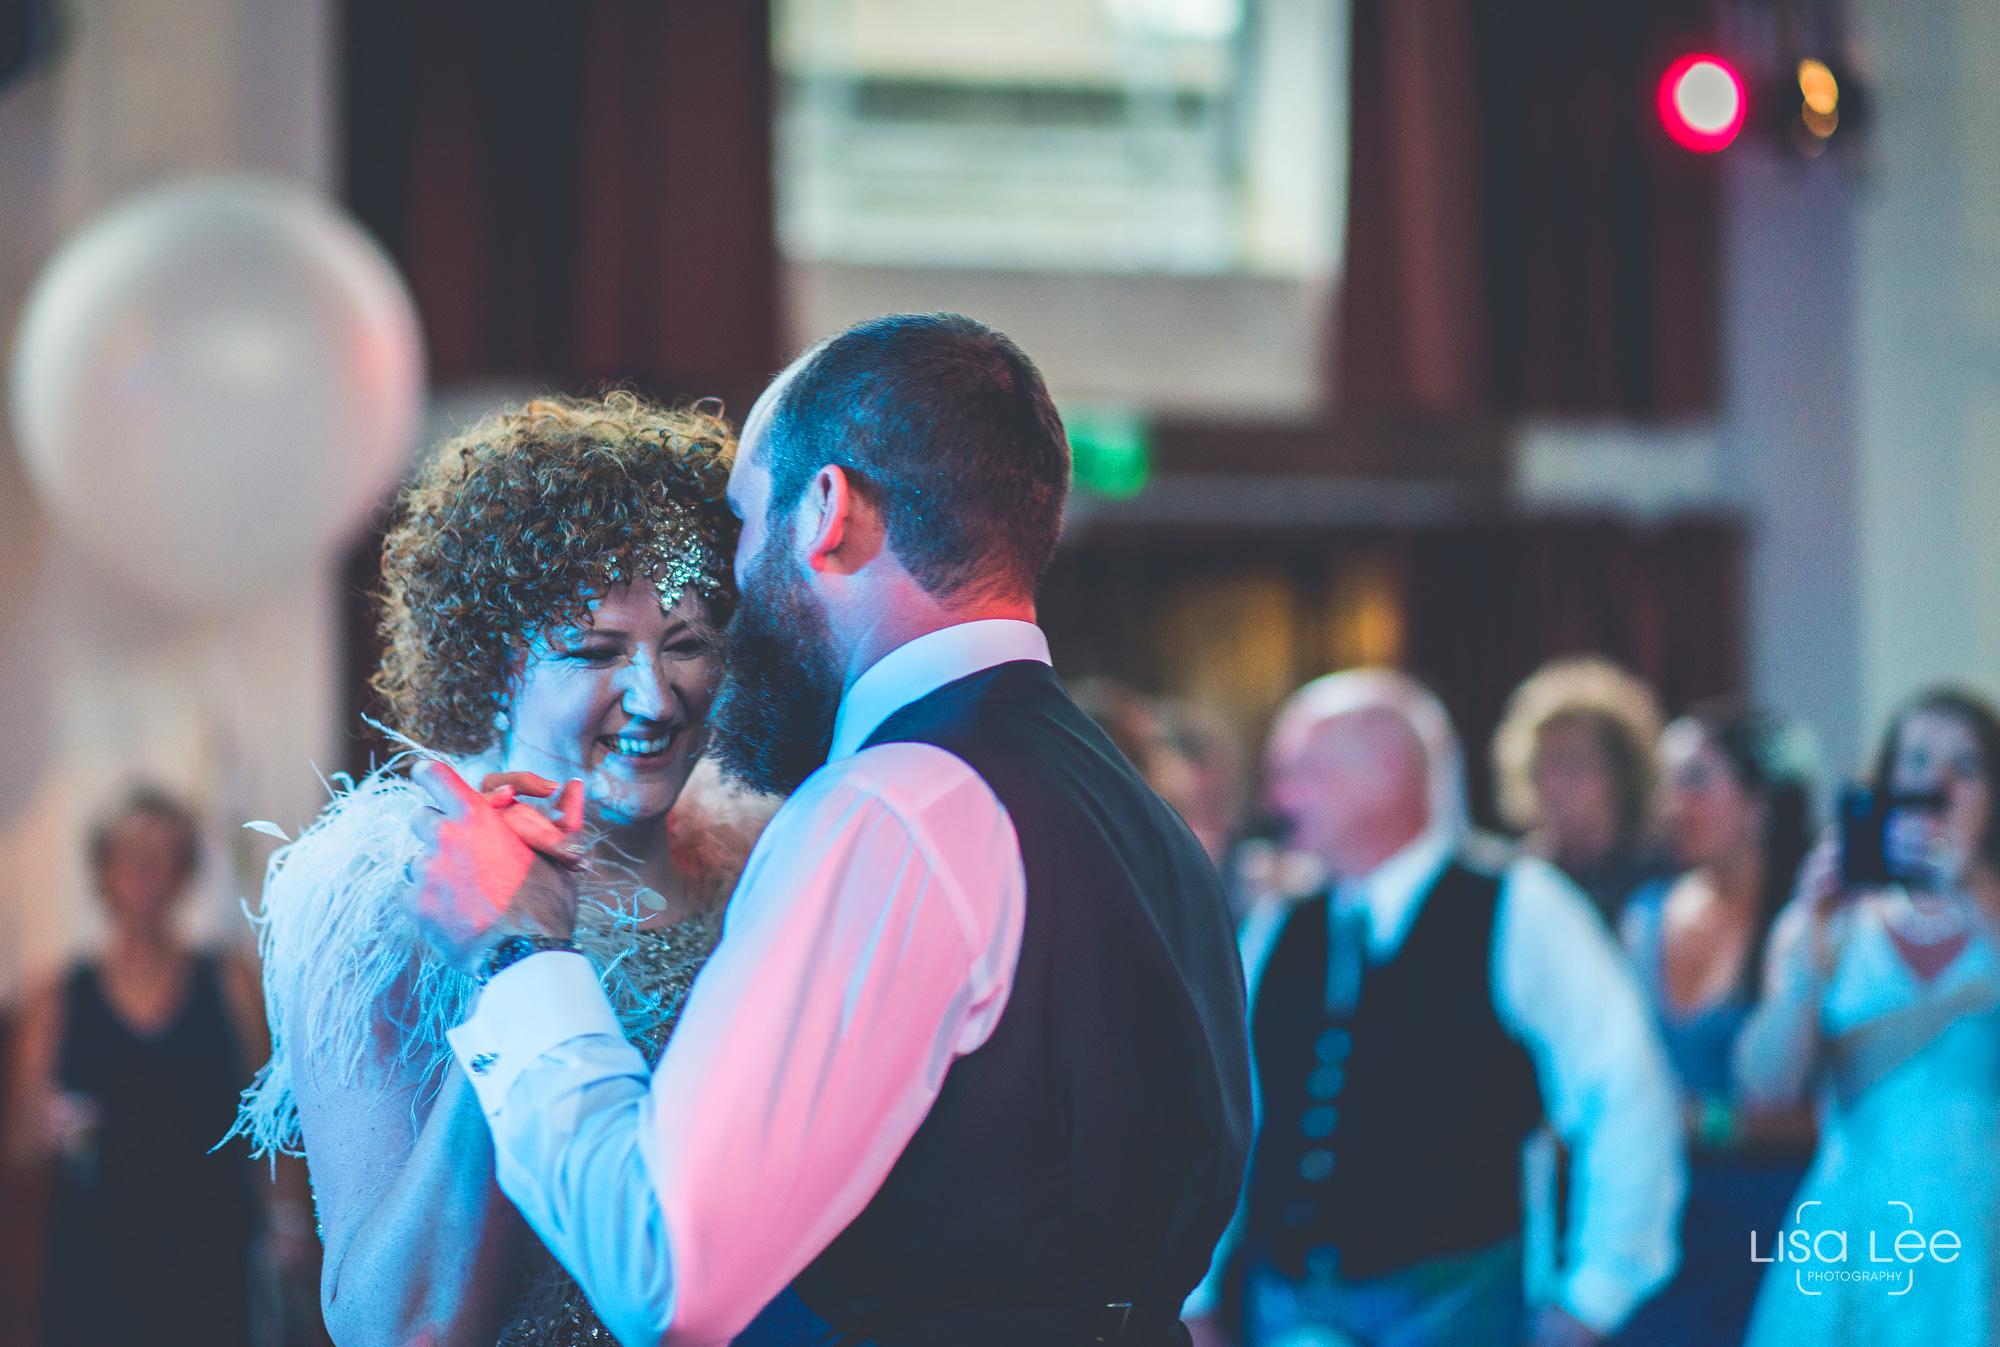 lisa-lee-wedding-photography-first-dance-talbot-heath-2.jpg